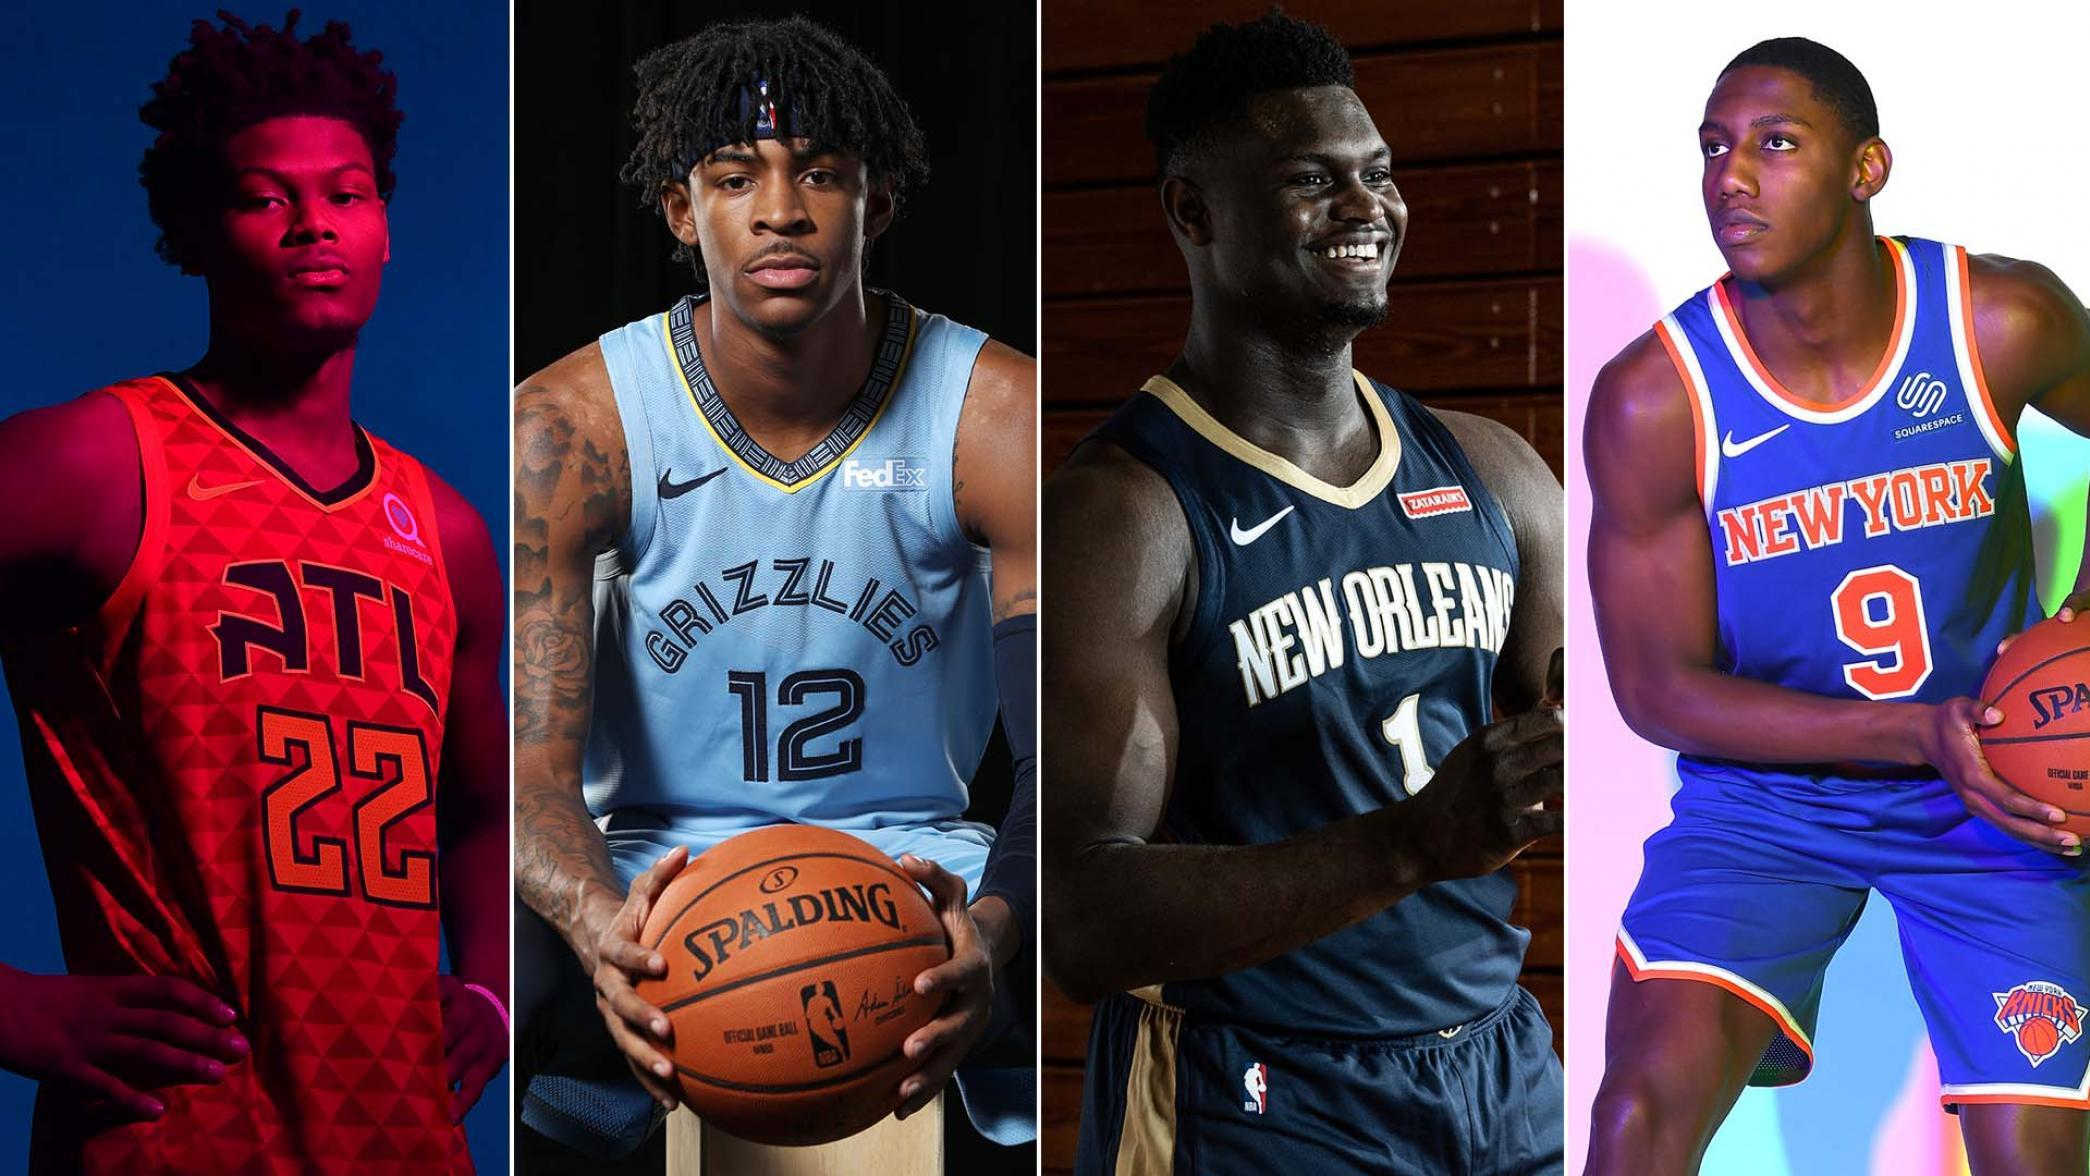 NBA新秀调查之最佳新秀:前三顺位分列前三,雷迪什上榜